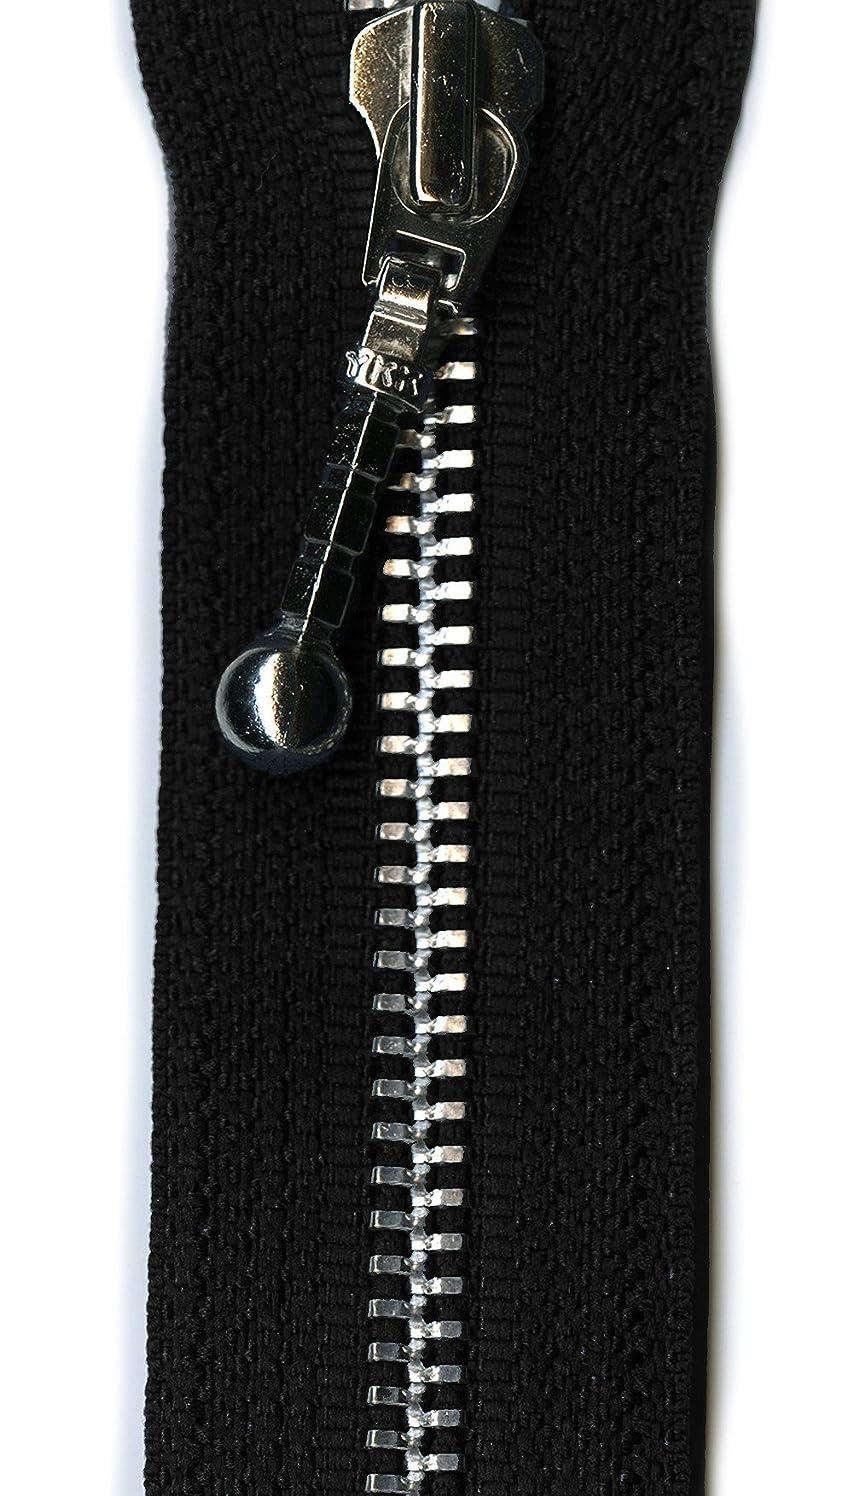 YKK Aluminum Decorative 1-Way Separating Zipper, 26